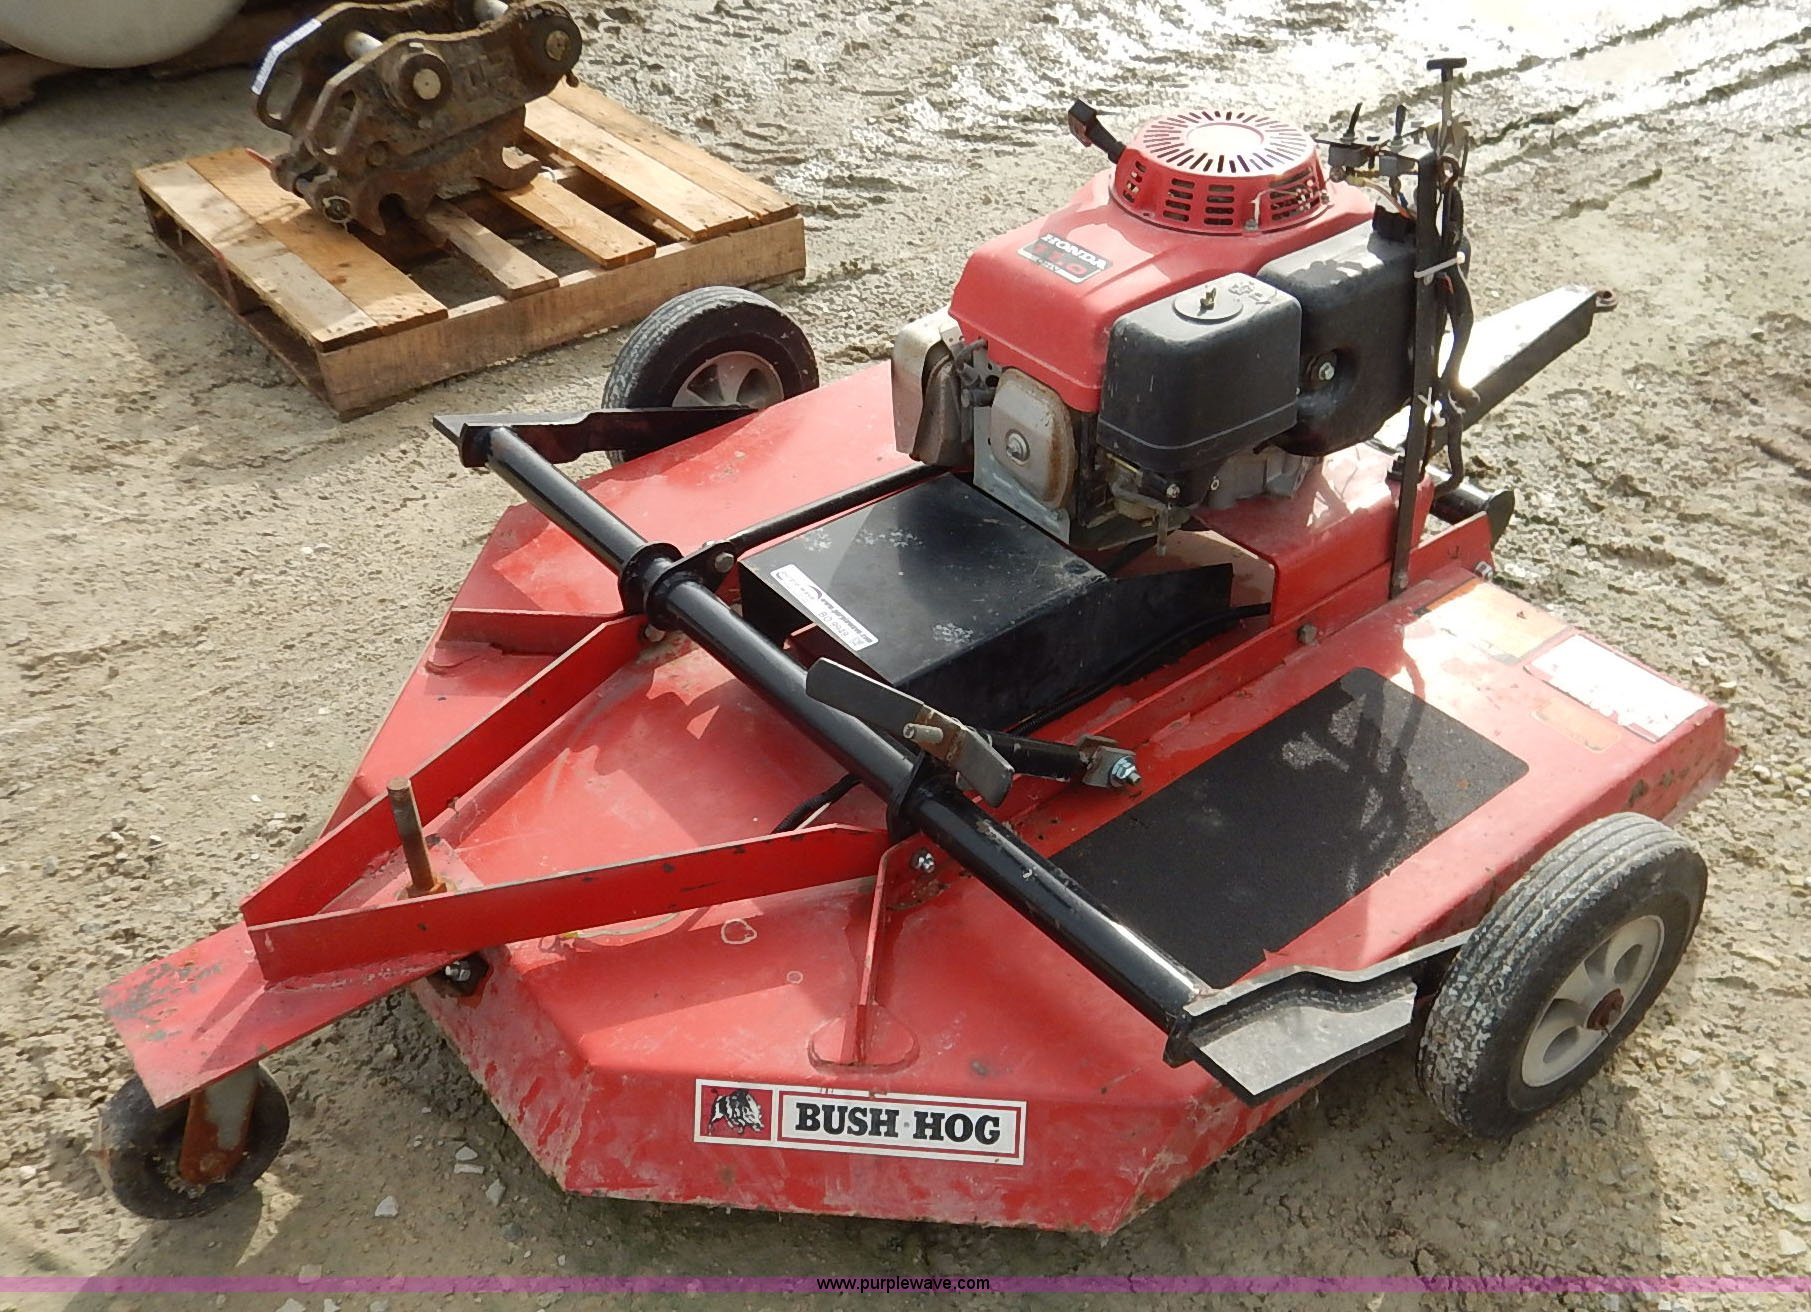 Bush Hog Gt42 Rotary Mower Item Bo9949 8 26 2015